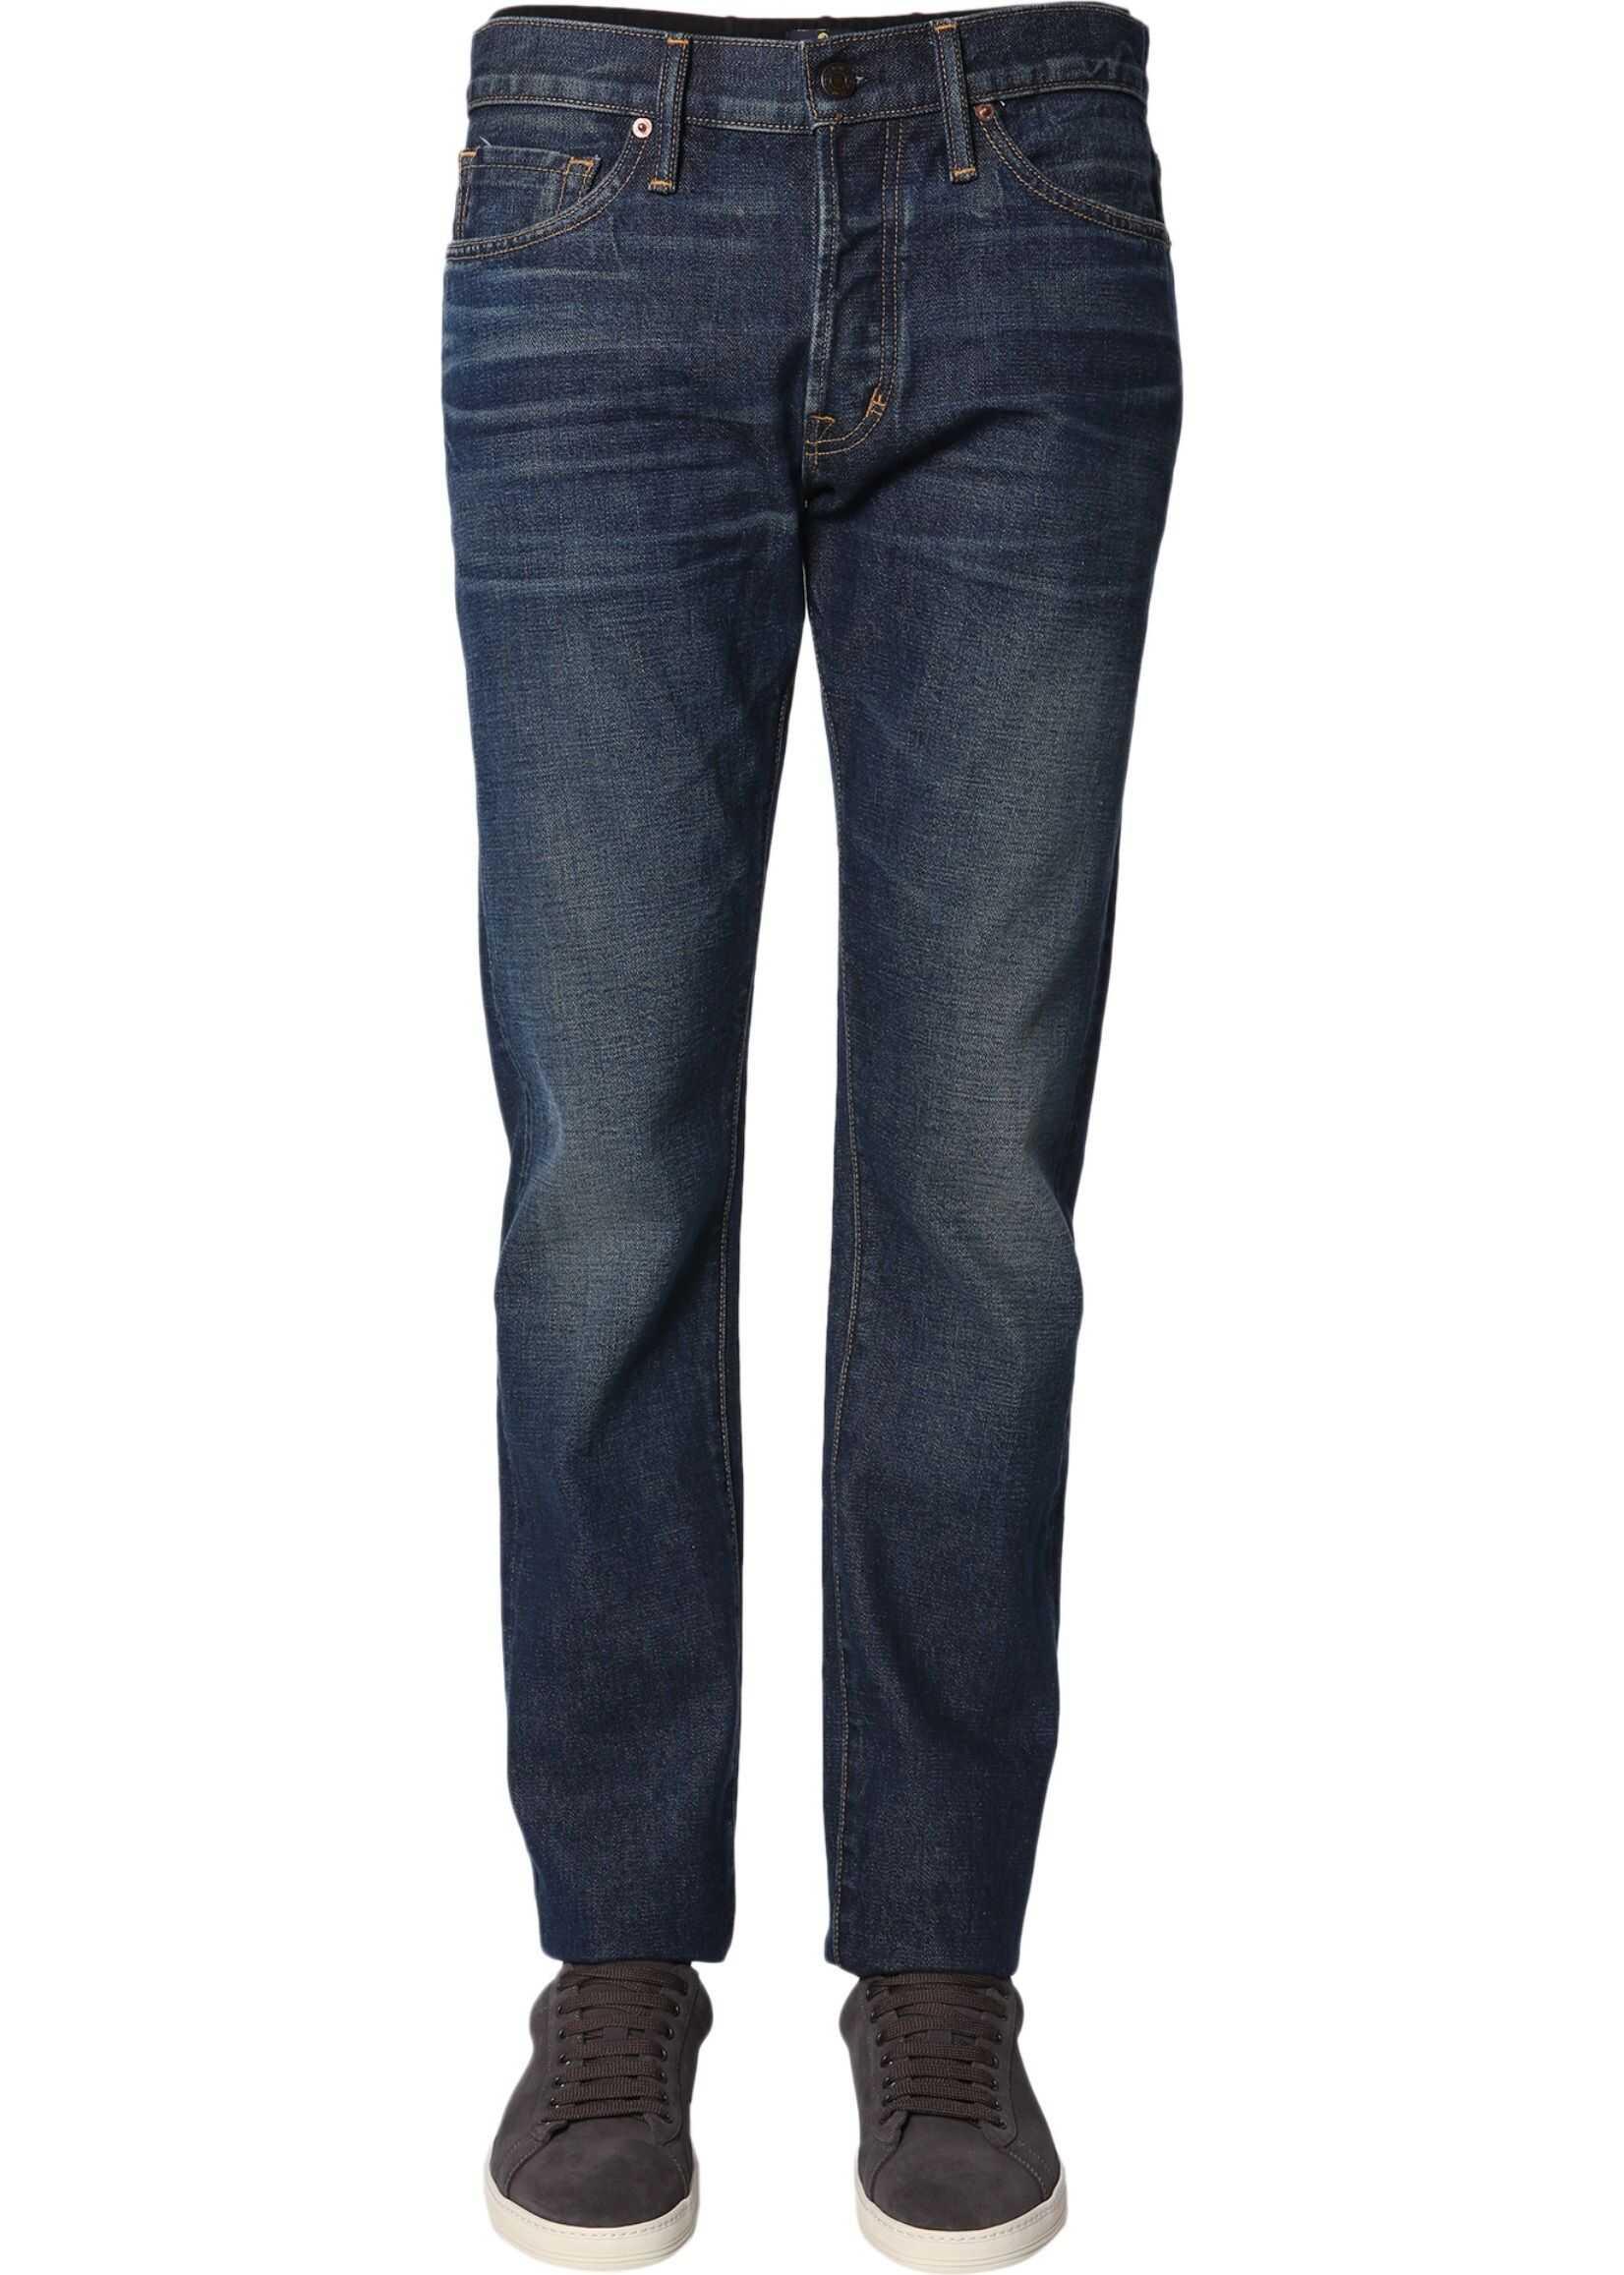 Tom Ford Slim Fit Jeans BLUE